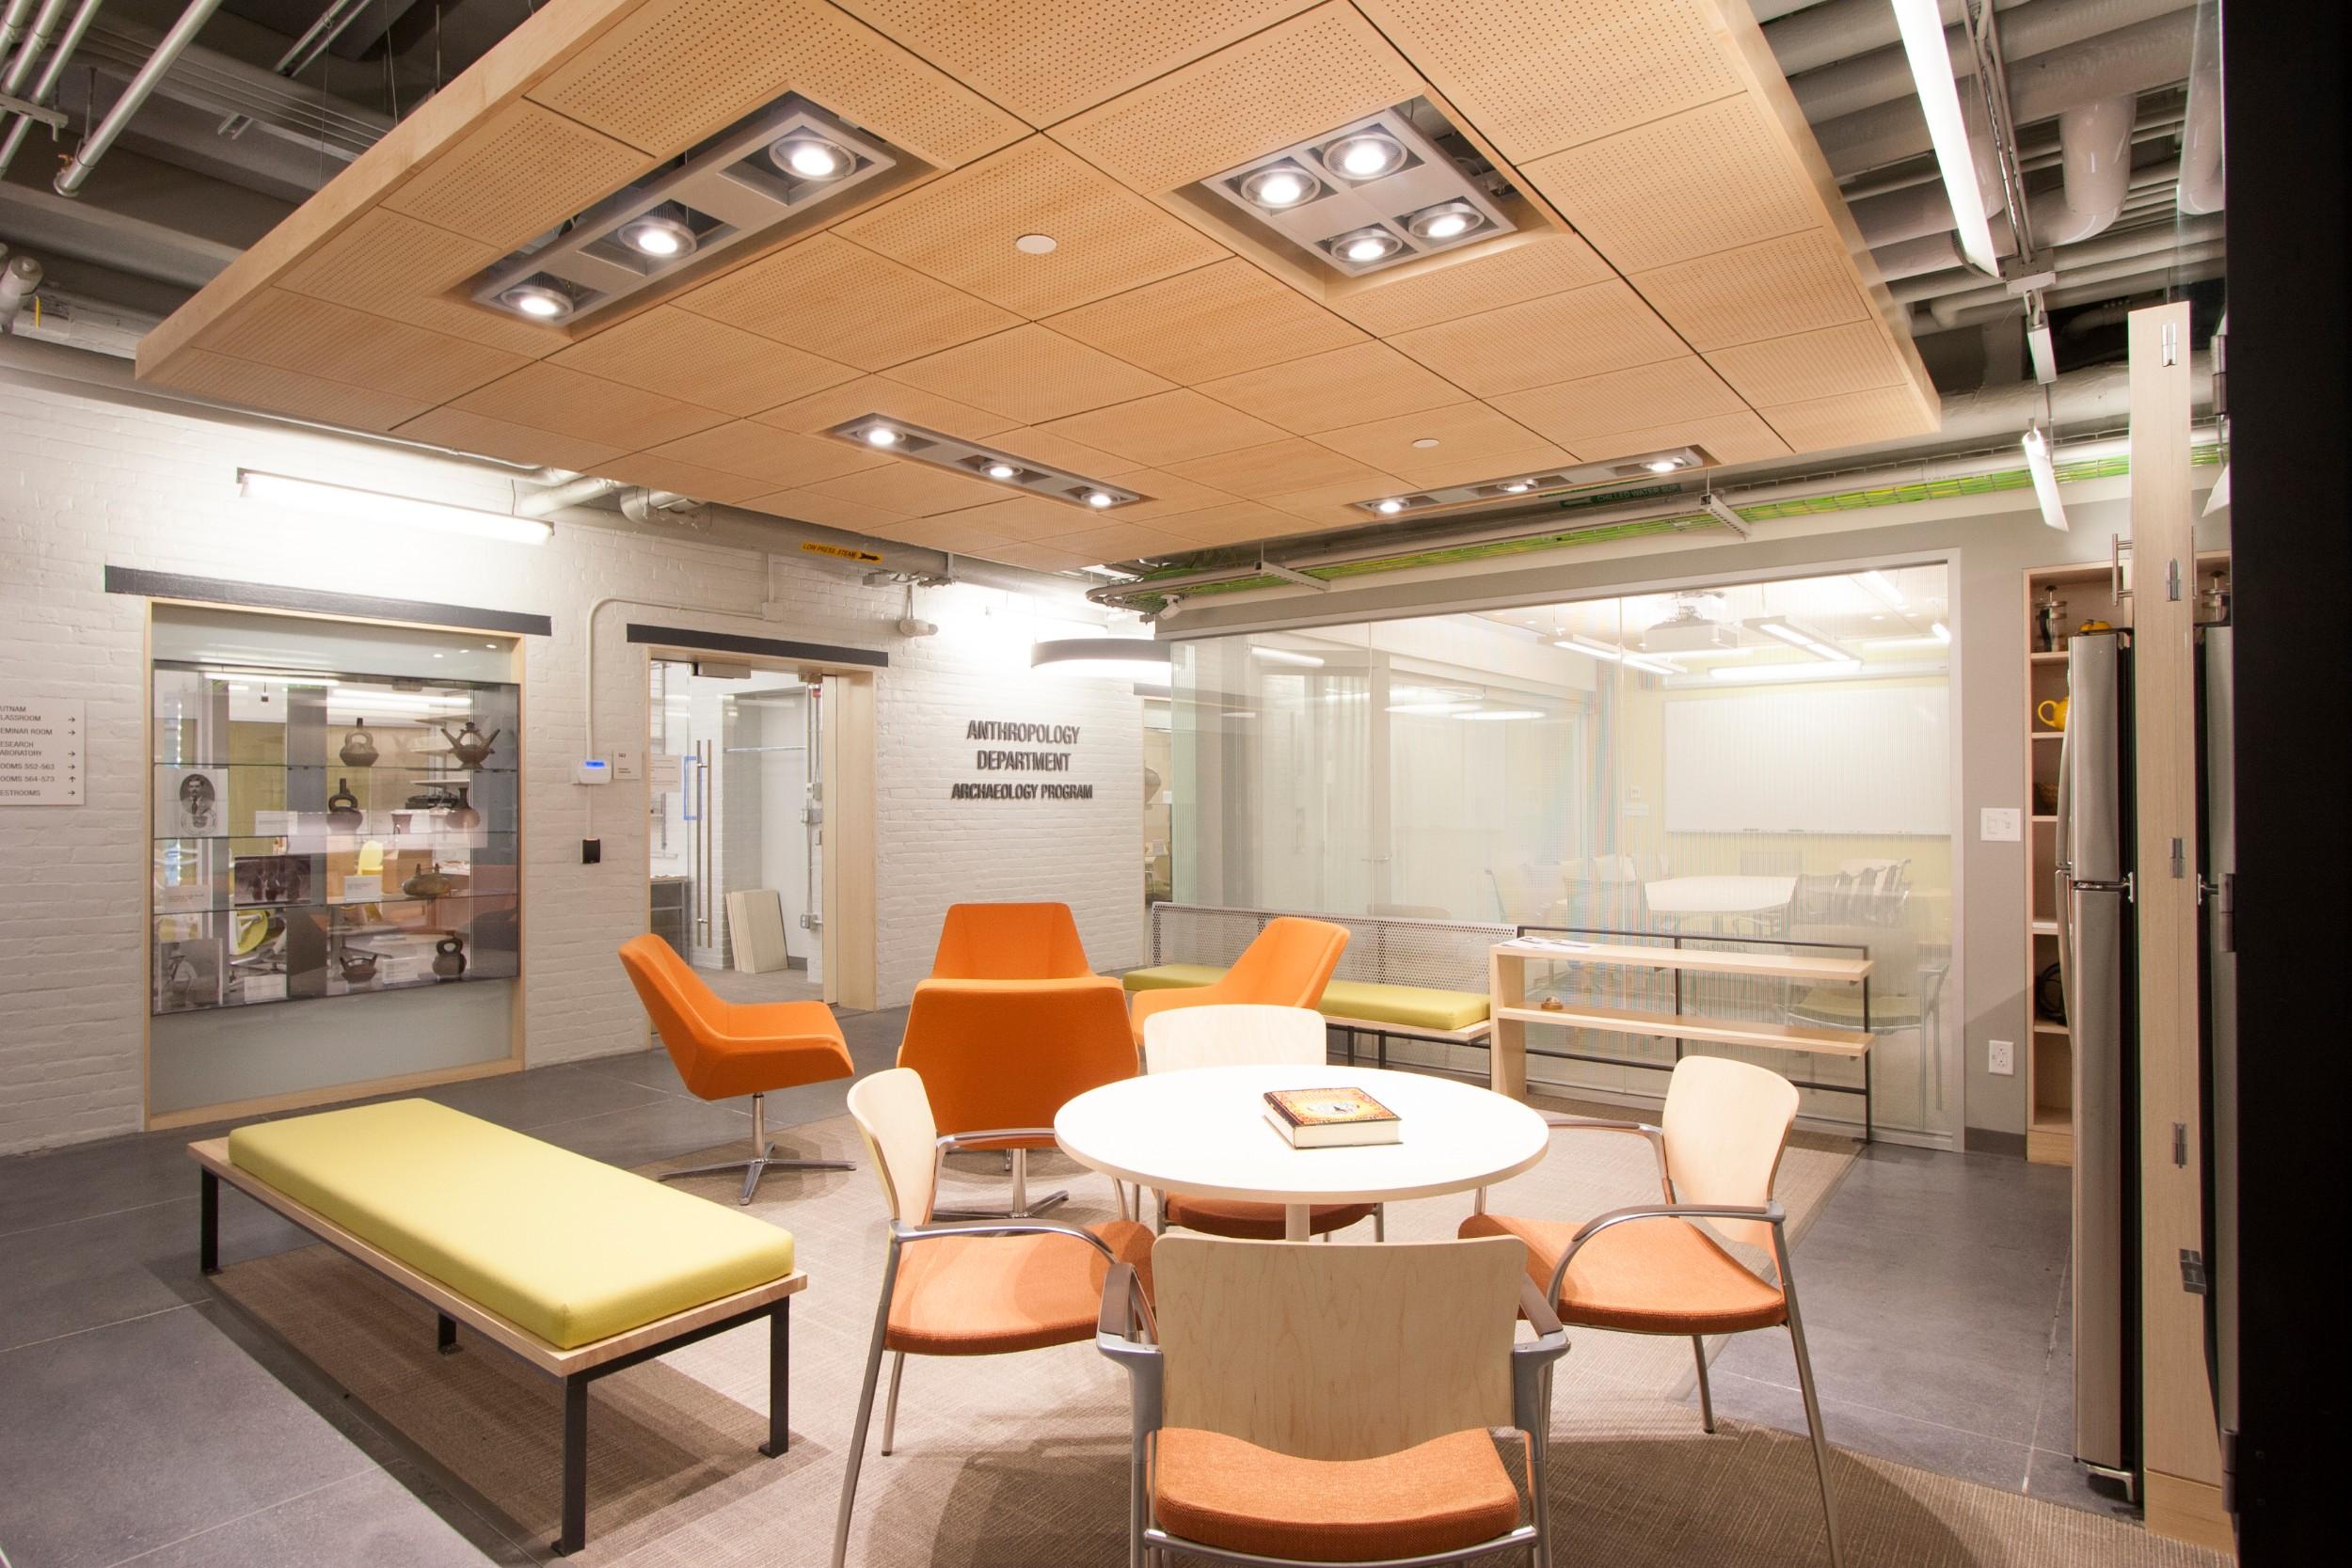 Harvard_University_Corderman_Construction_Anthropology_Department_Reception_Lounge.jpg